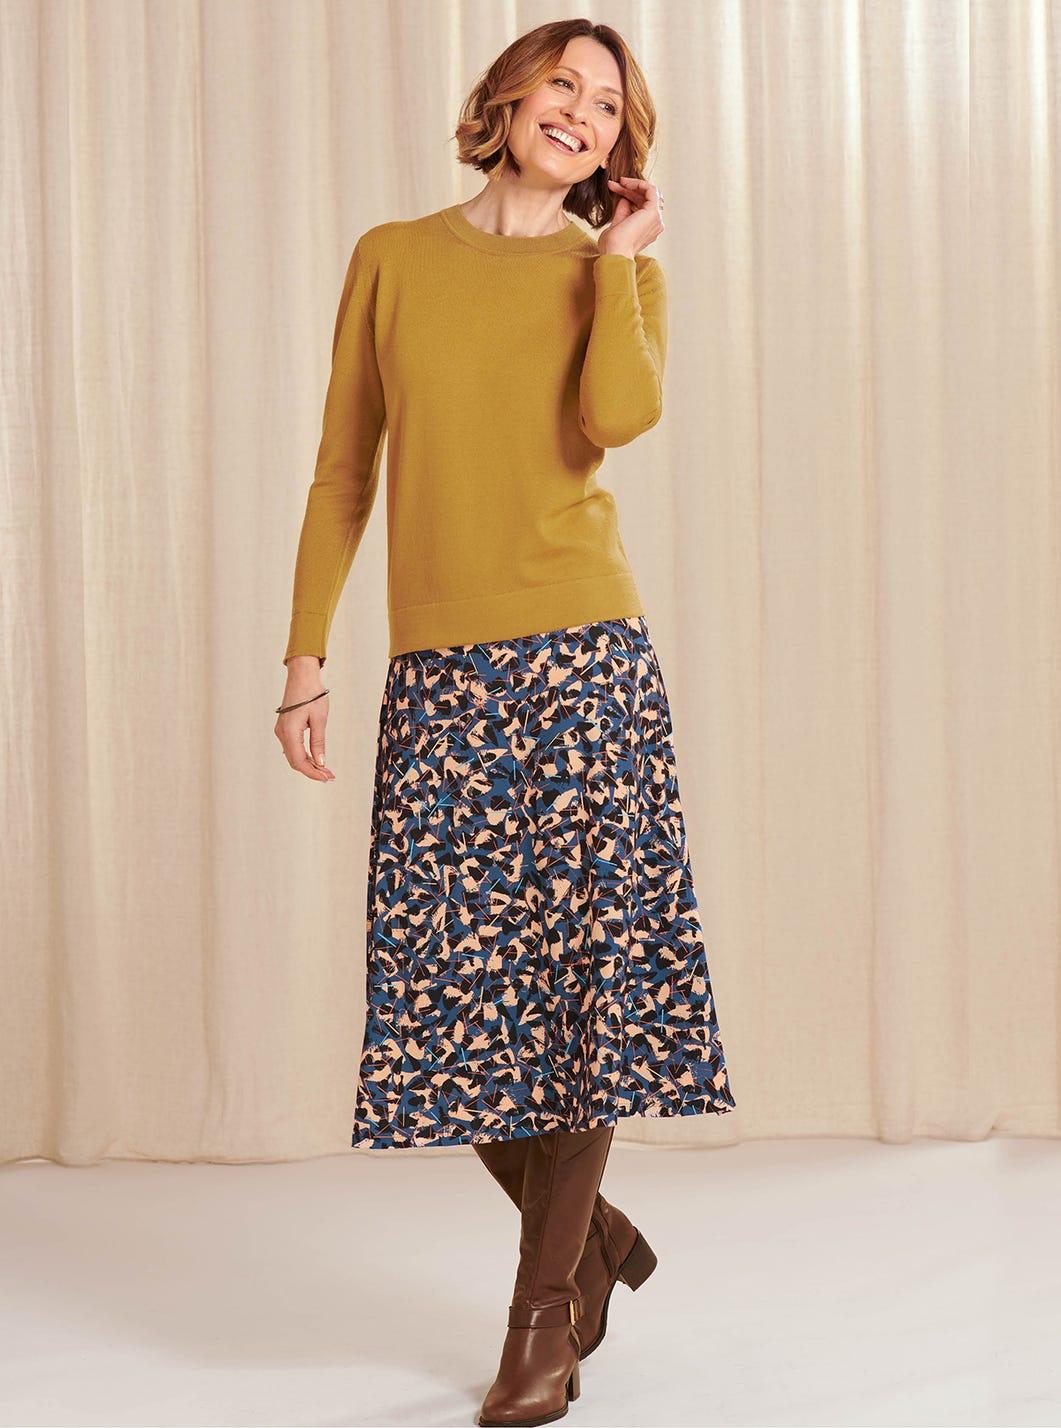 Contemporary Print Skirt